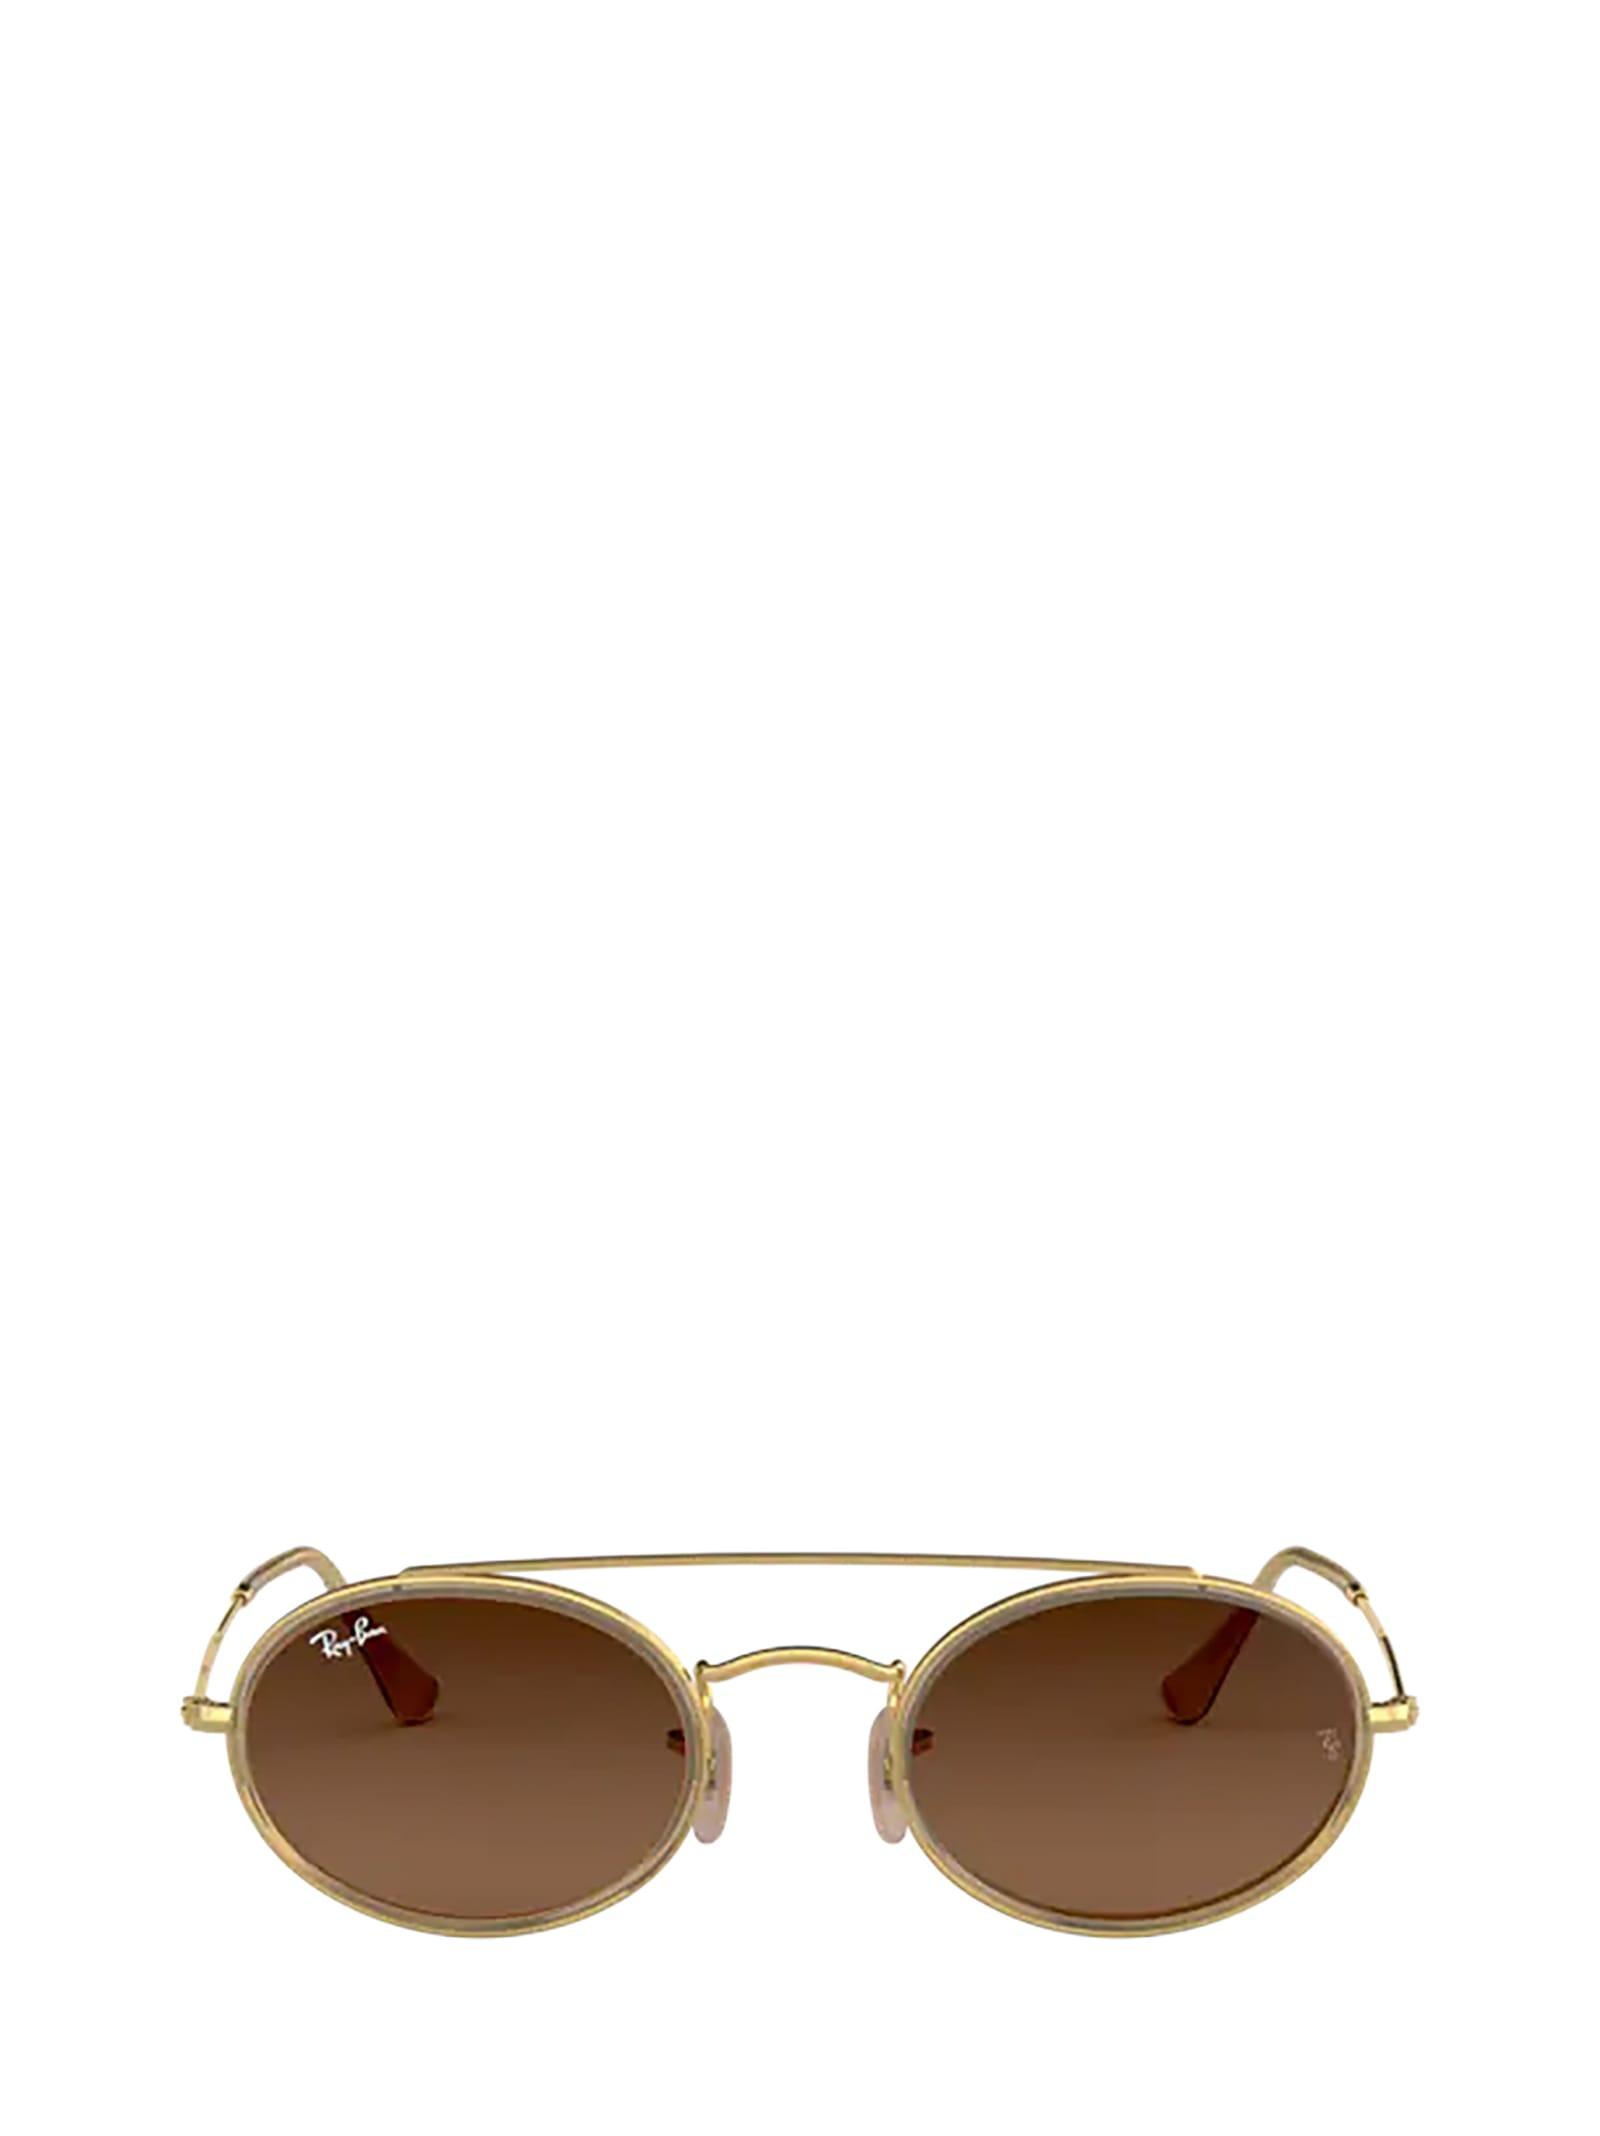 Ray-Ban Ray-ban Rb3847n Arista Sunglasses